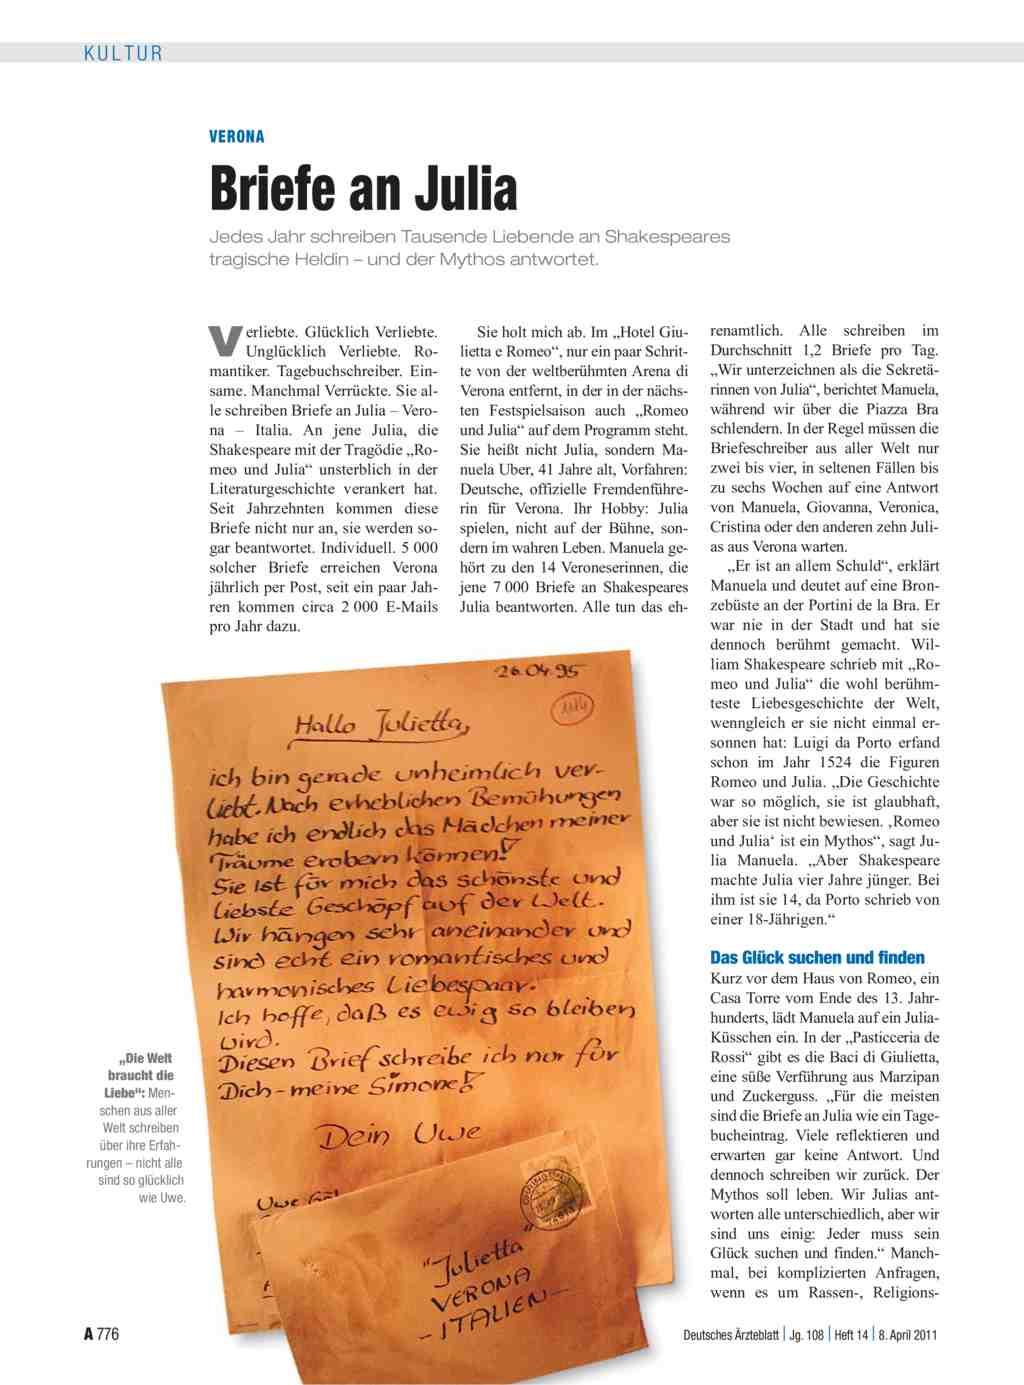 Briefe Für Julia Stream : Verona briefe an julia